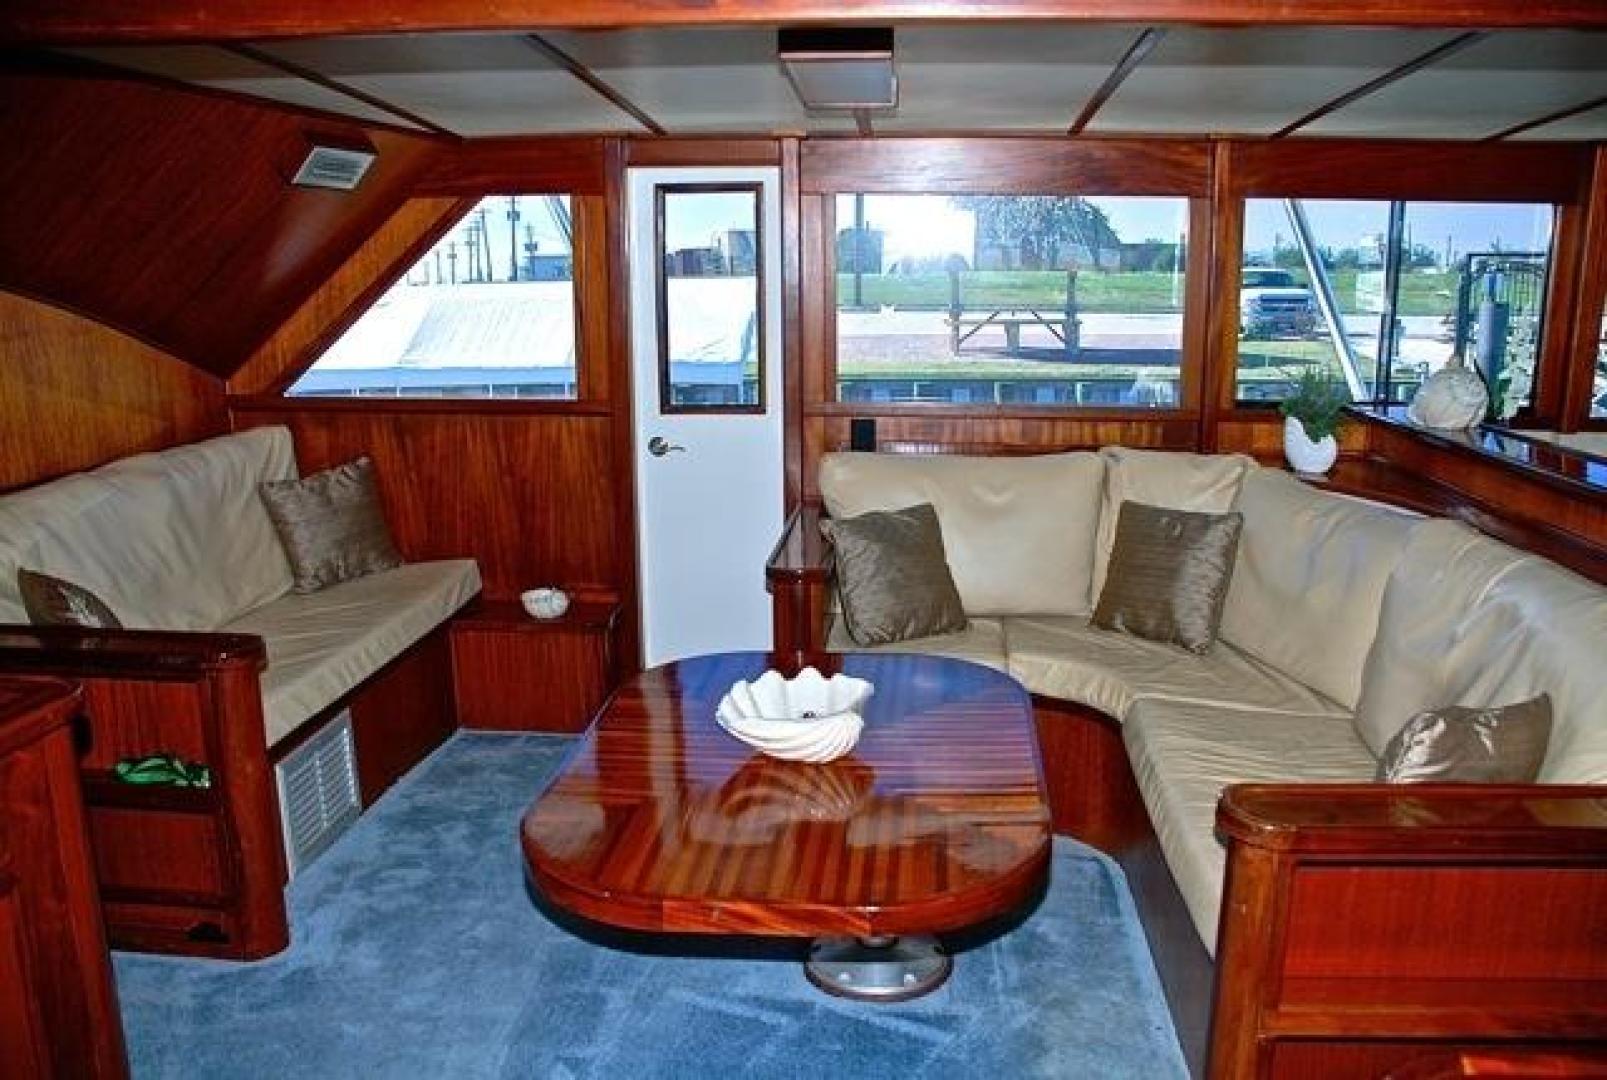 Infinity-Cockpit Motor Yacht 2001-Dont Matter Houston-Texas-United States-Salon View 4-1005540 | Thumbnail